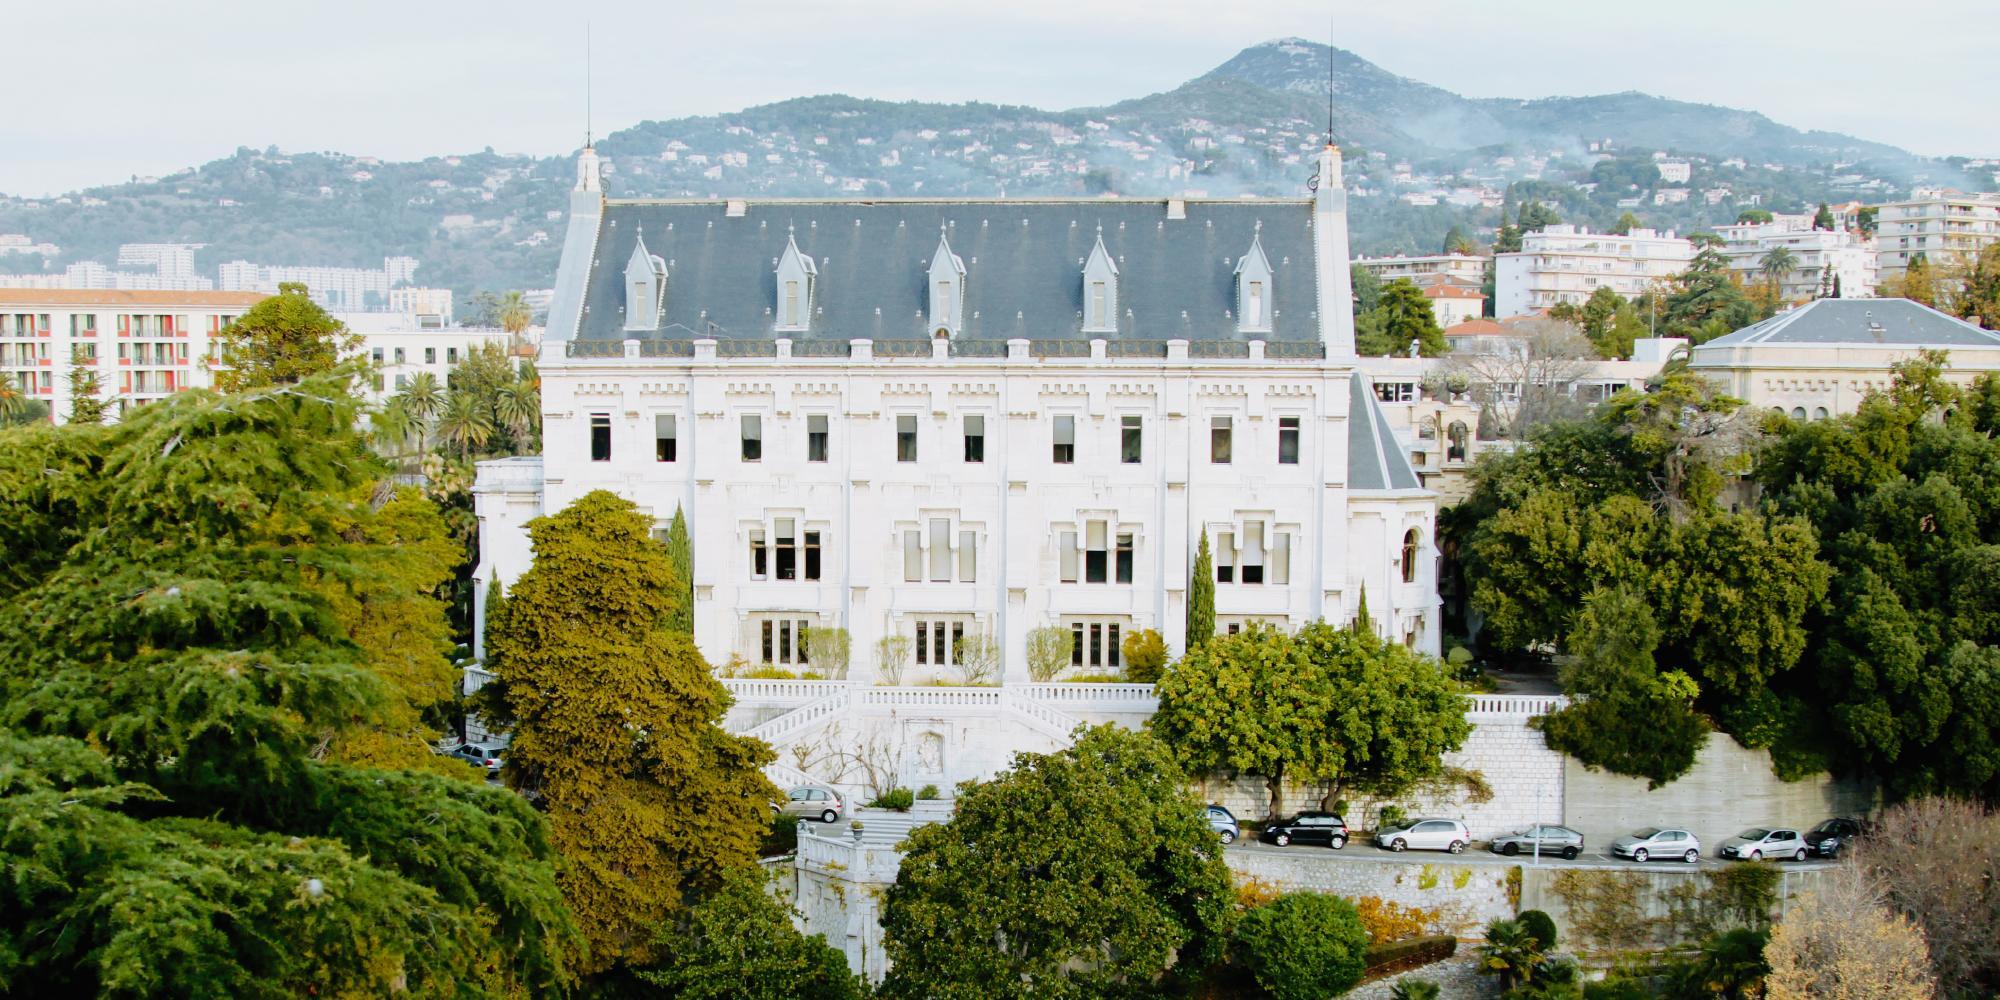 Vue du Grand Château de Valrose